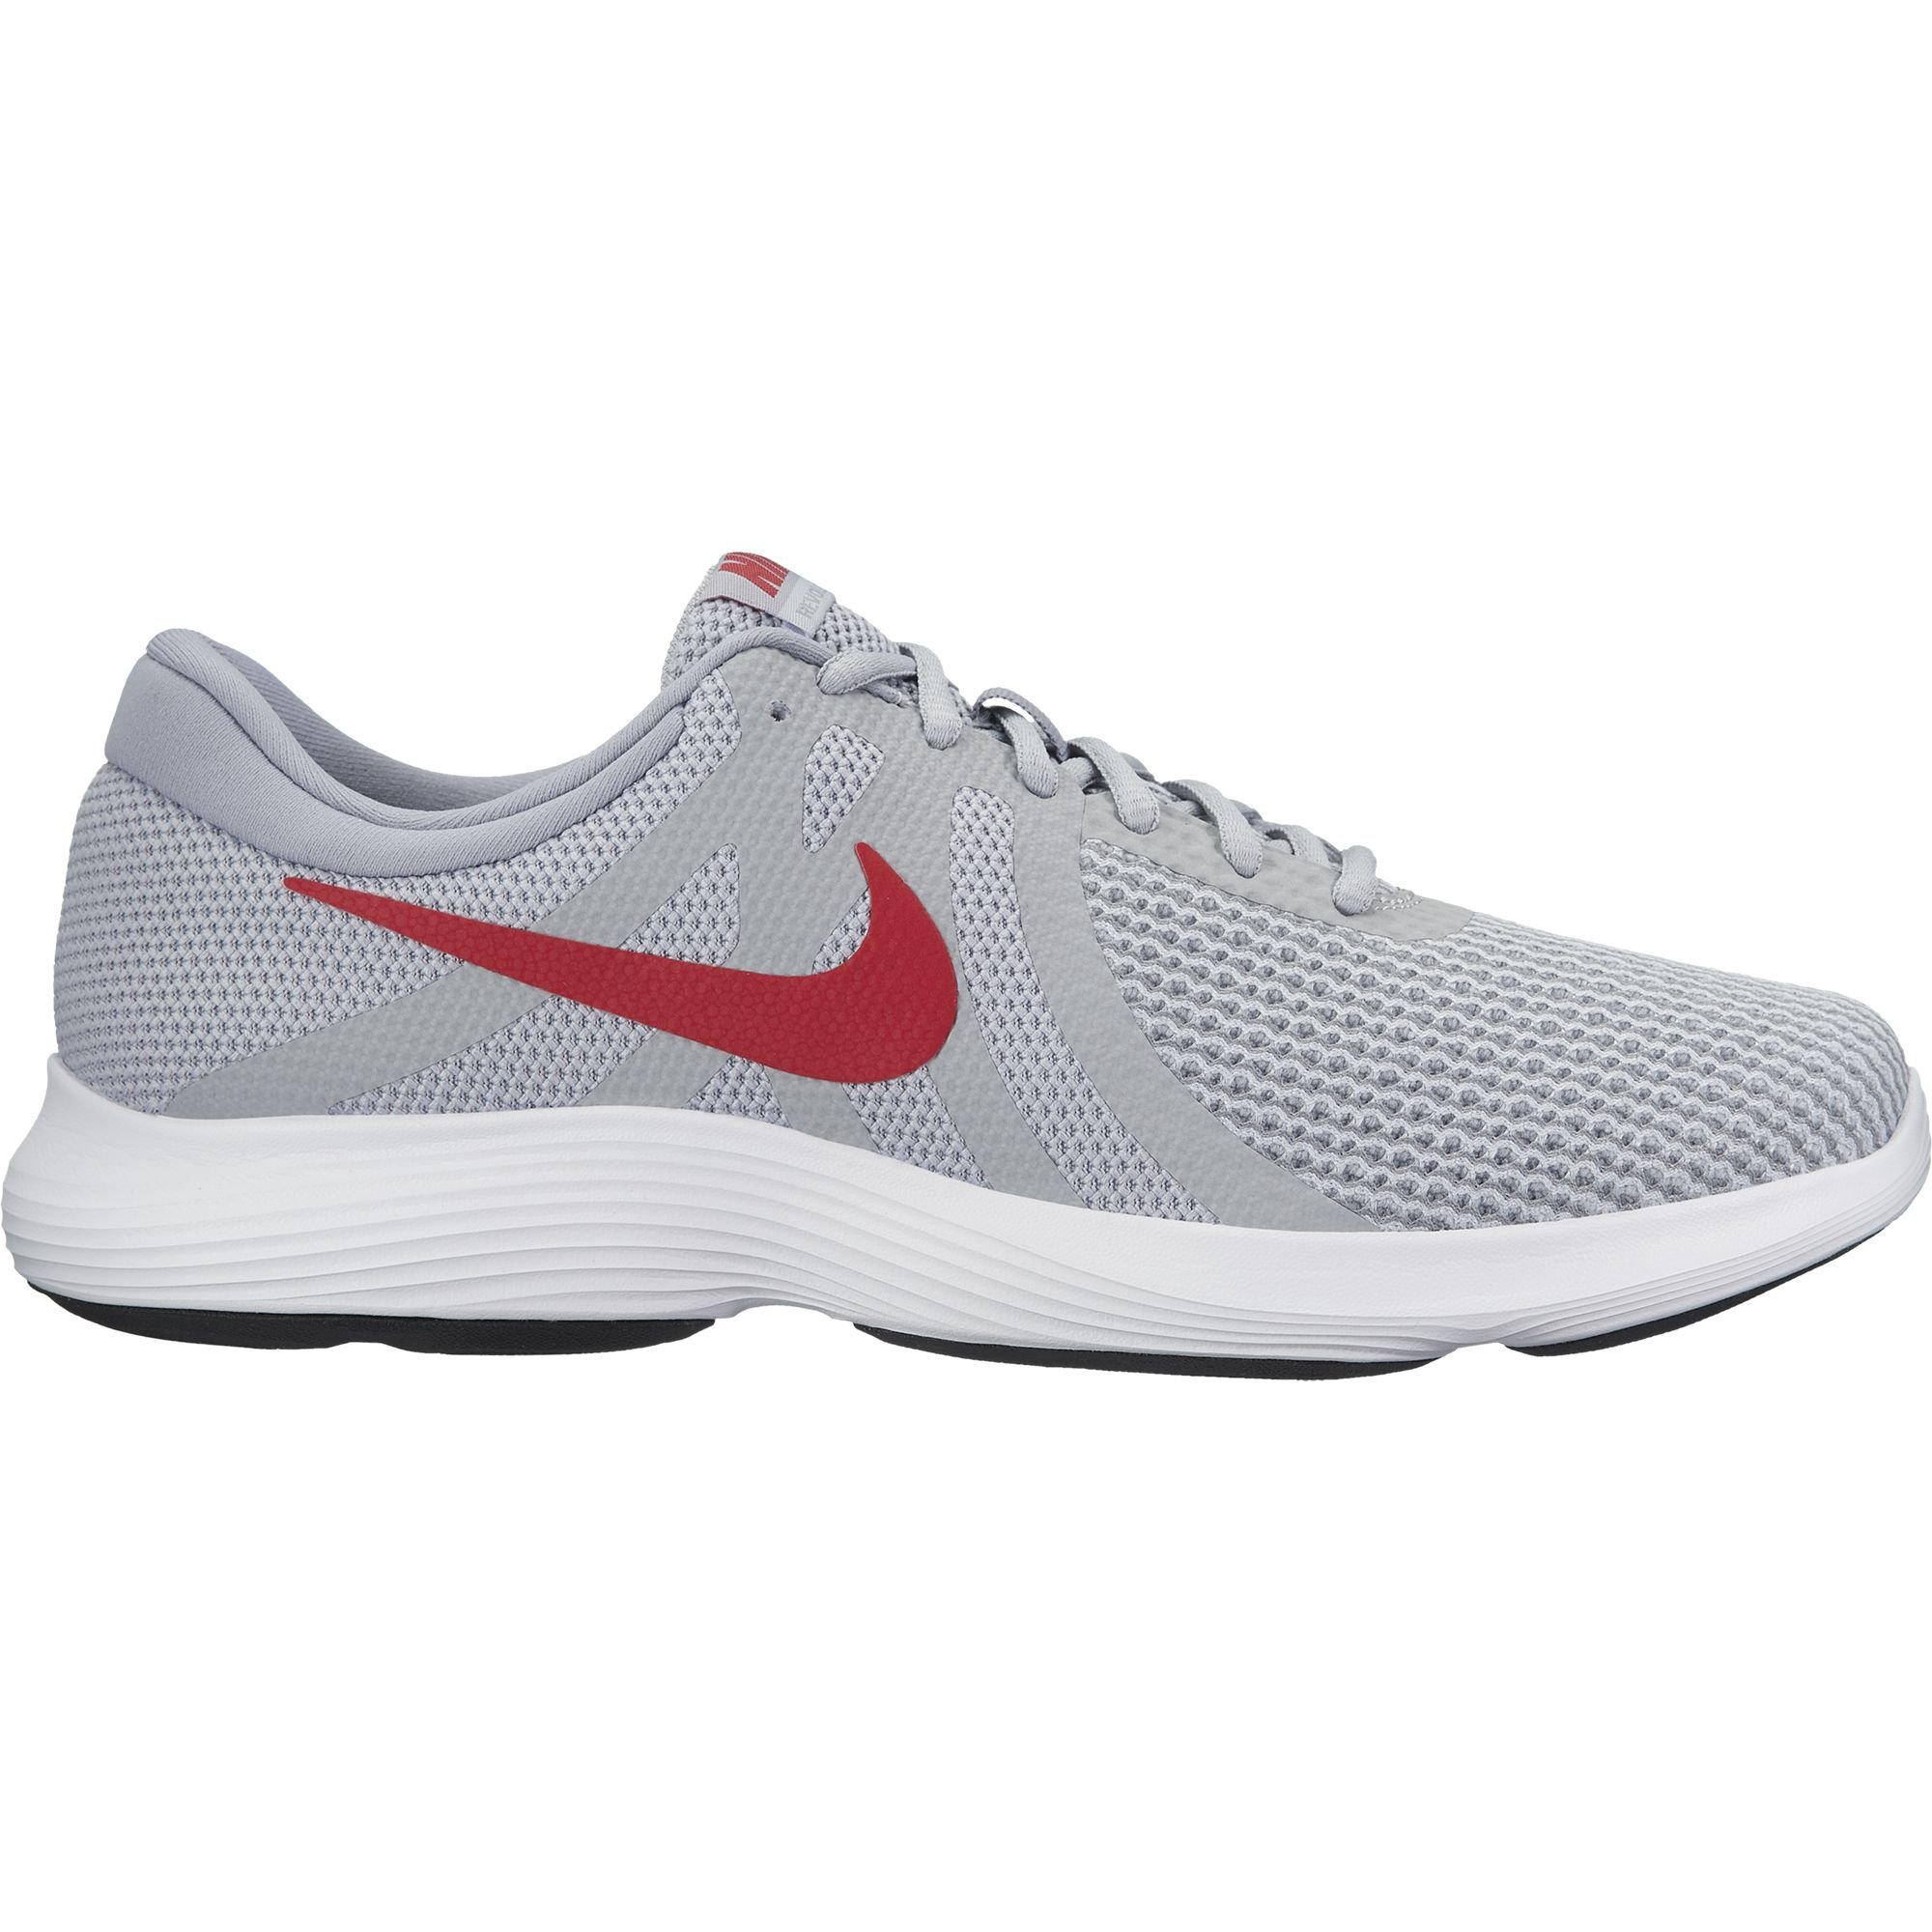 d9f228ba834 Galleon - Nike Men s Revolution 4 Running Shoe Wolf Grey Gym Red Stealth White  Size 14 M US